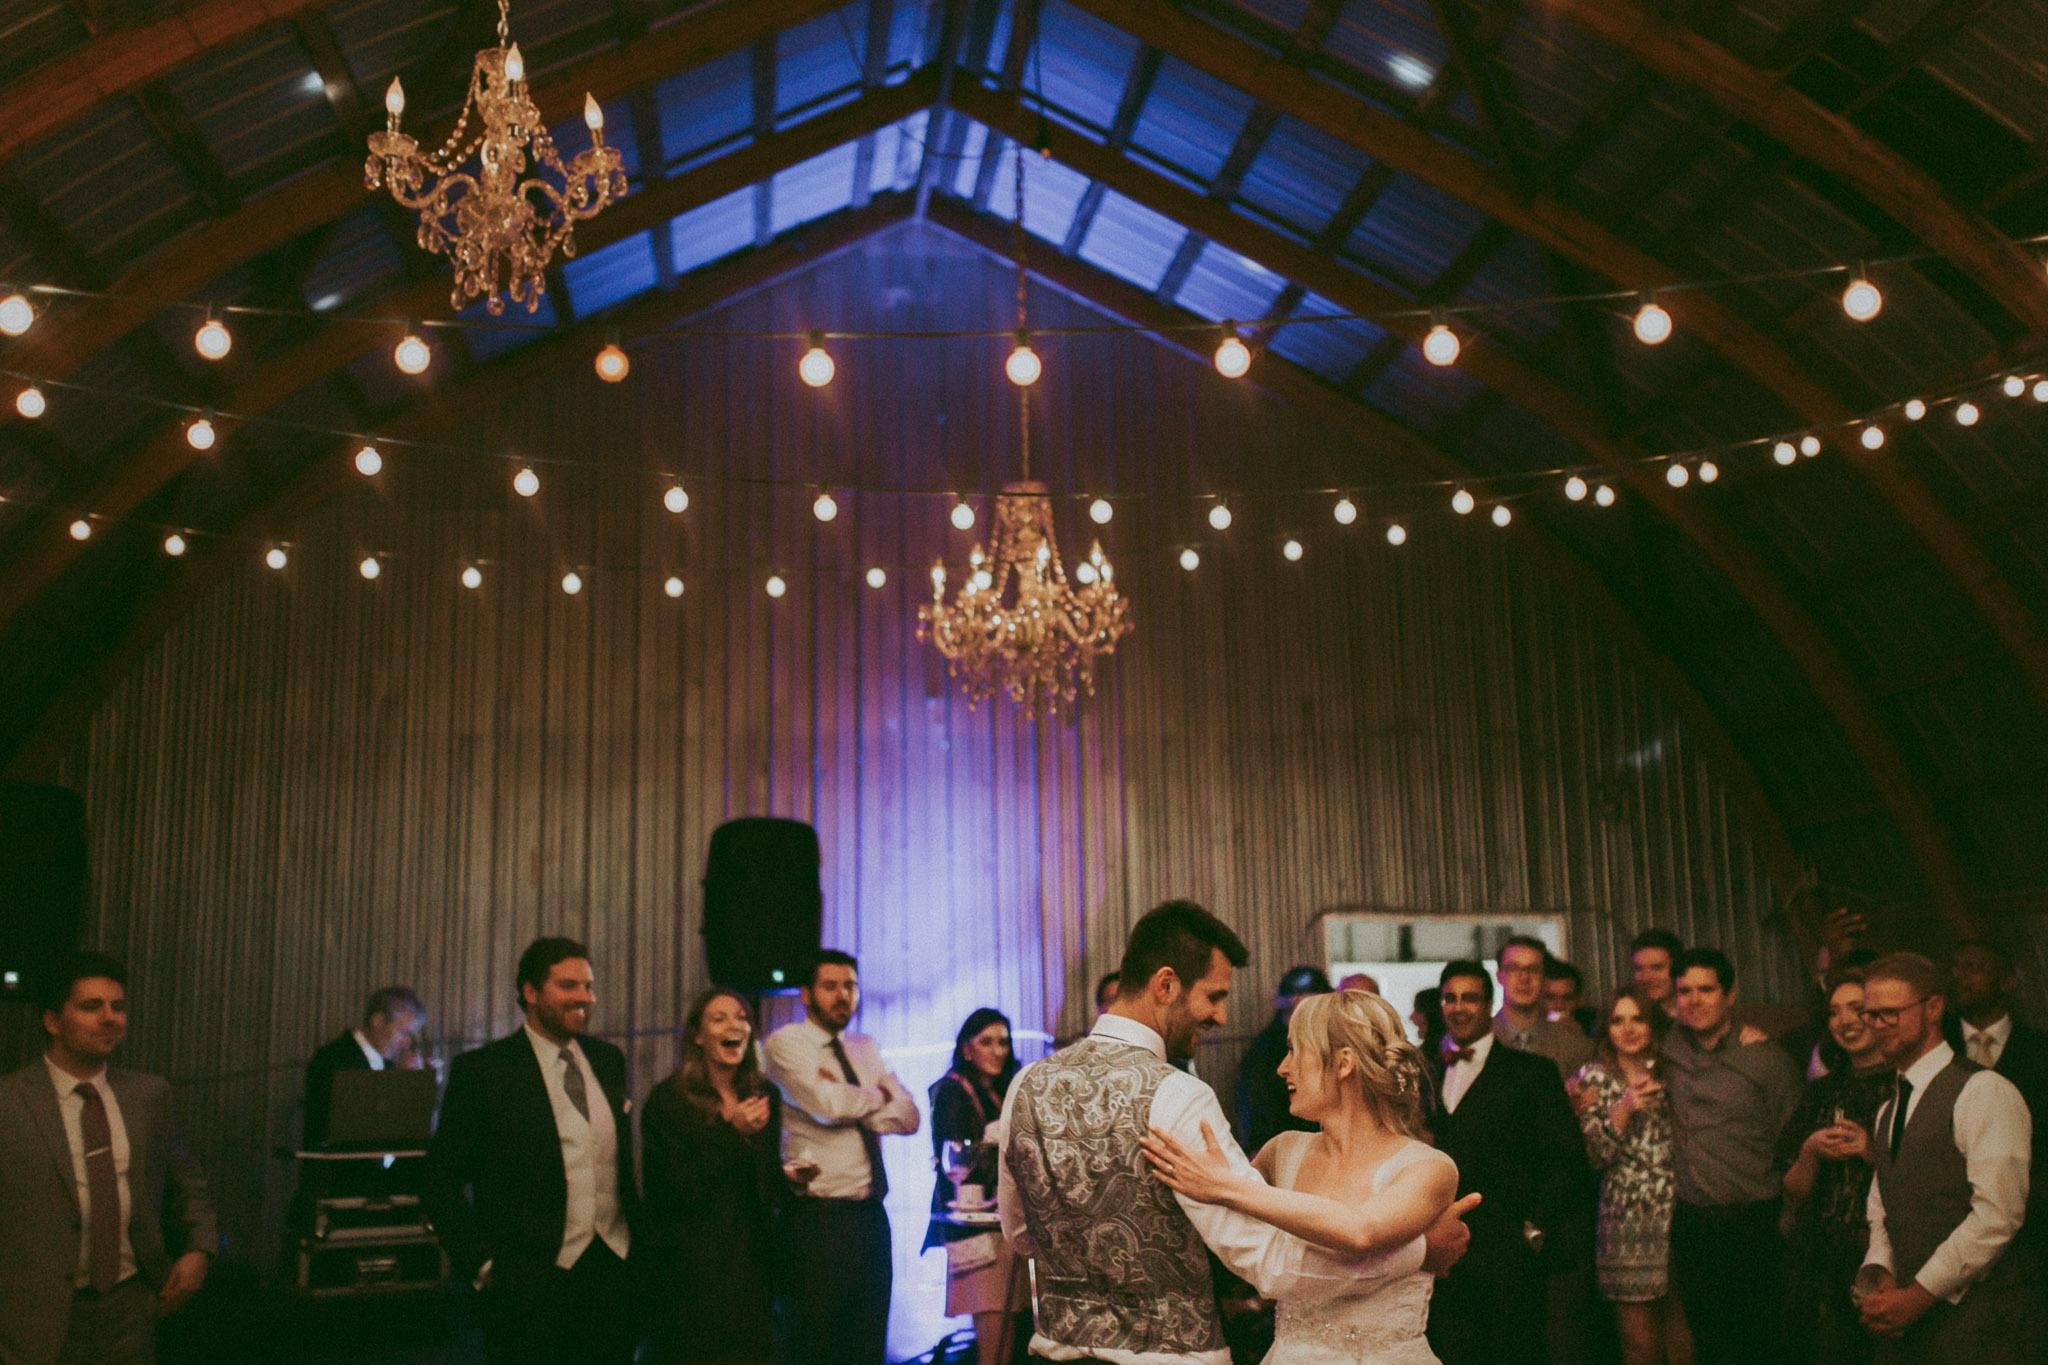 Durali Villa Wedding - Indoor Barn Reception and Dances